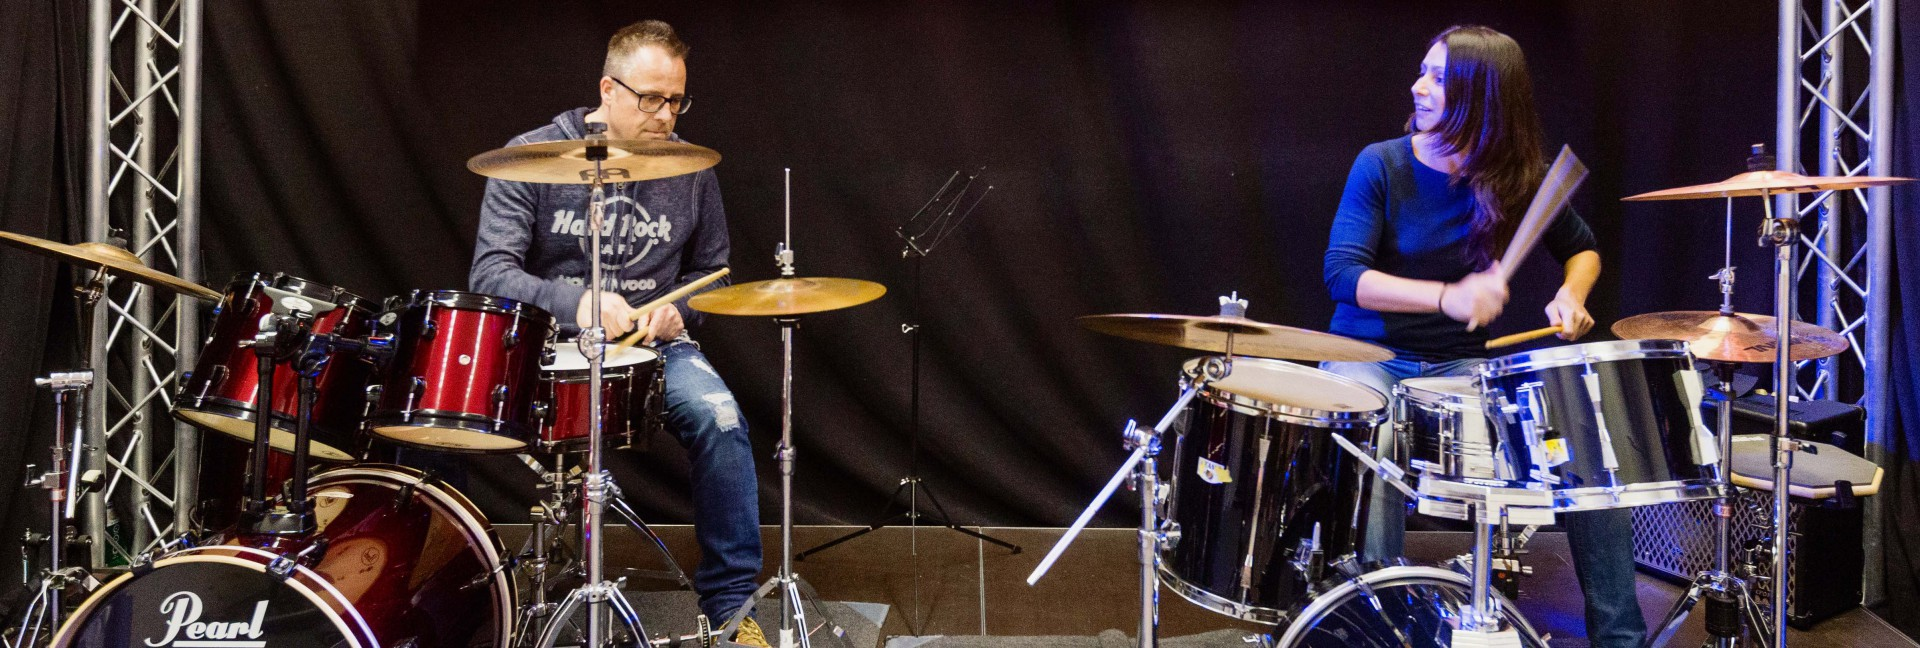 Drums-55_Slider.jpg